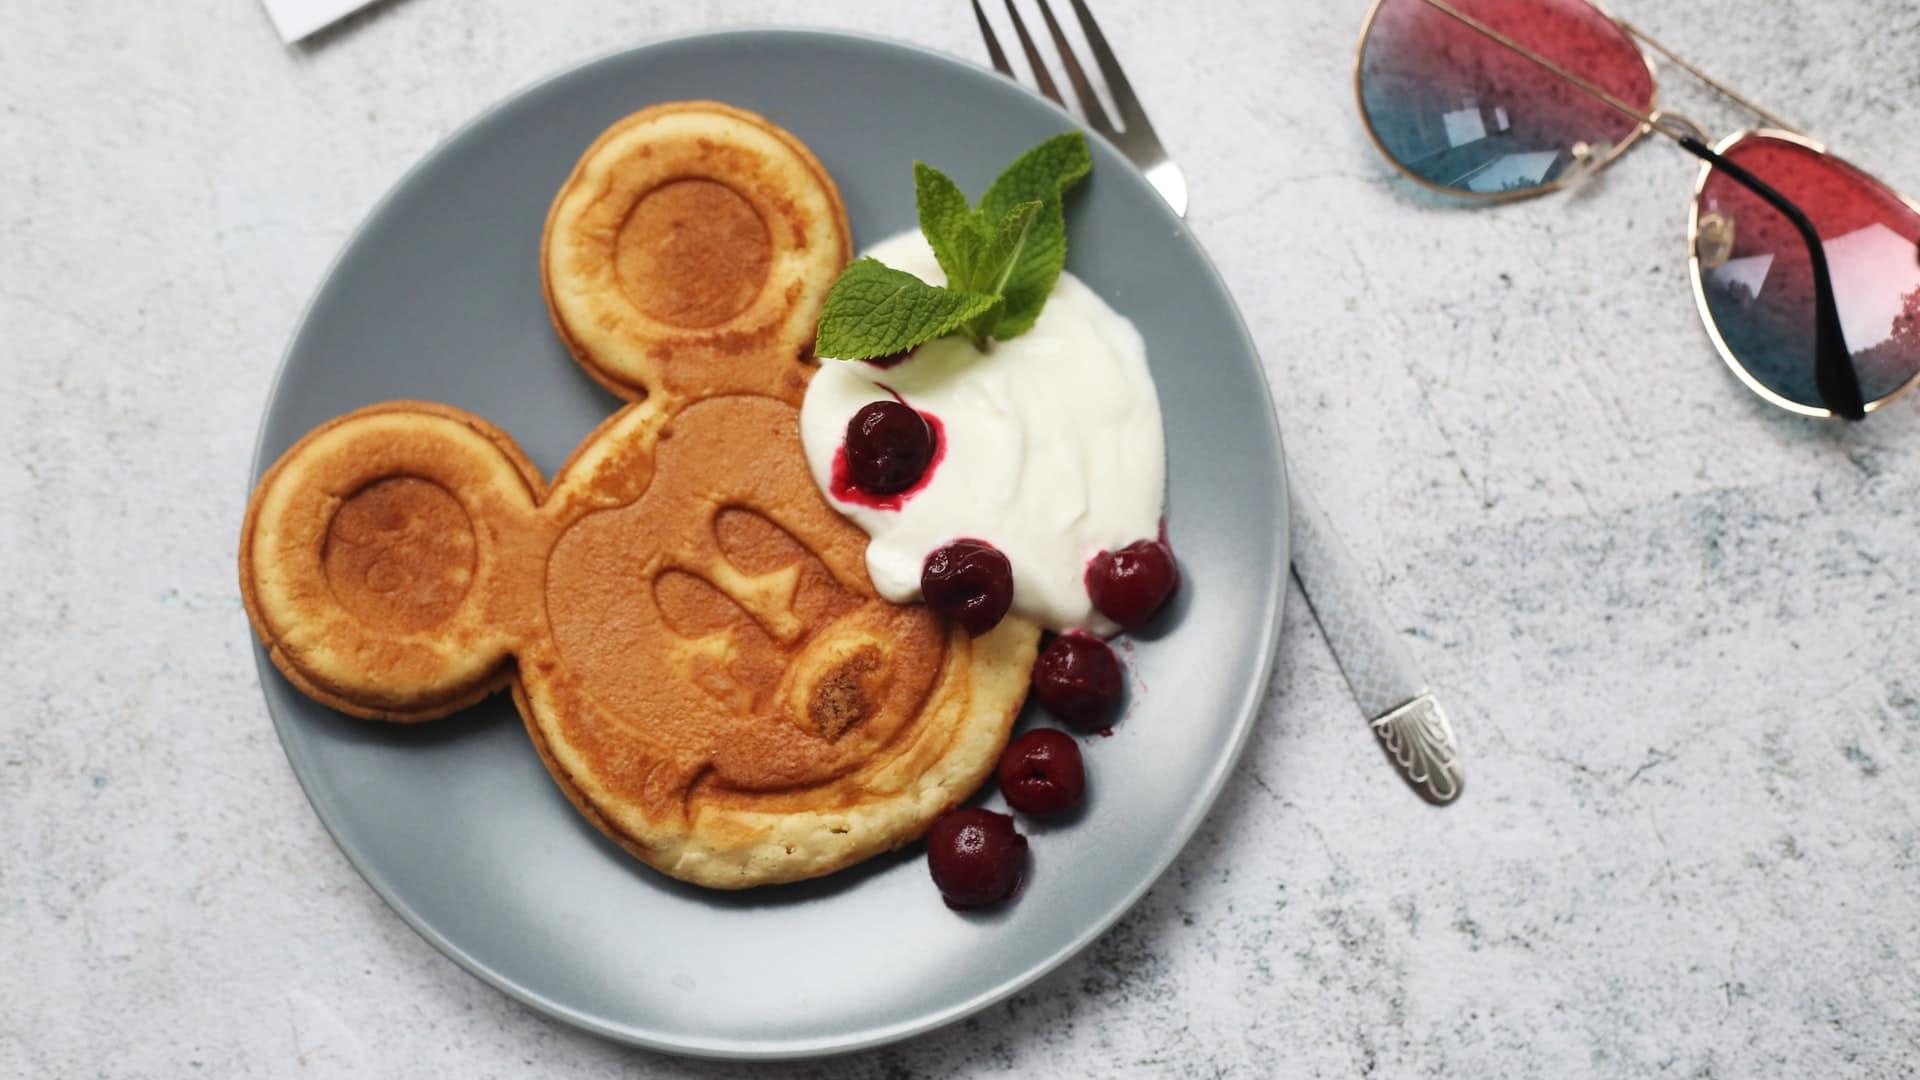 disneyland paris restaurants manger snack food